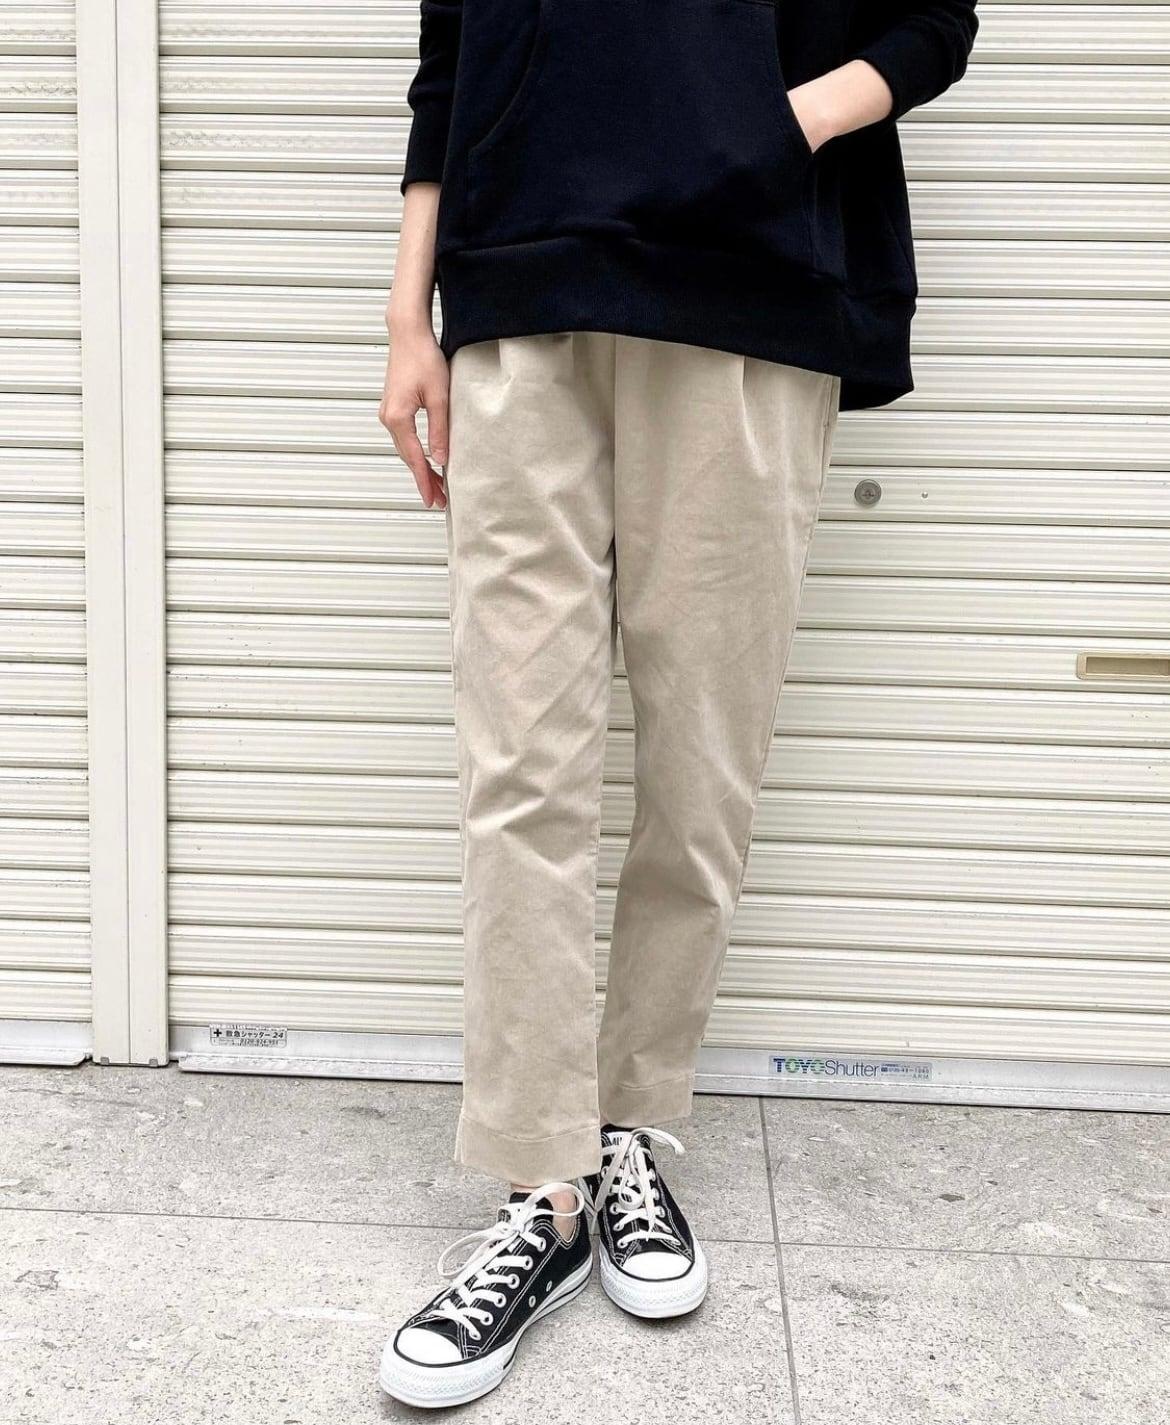 《ご予約品》10月中旬納期【 siro de labonte 】- R153301 - STRETCH CORDUROY PANTS ¥15400